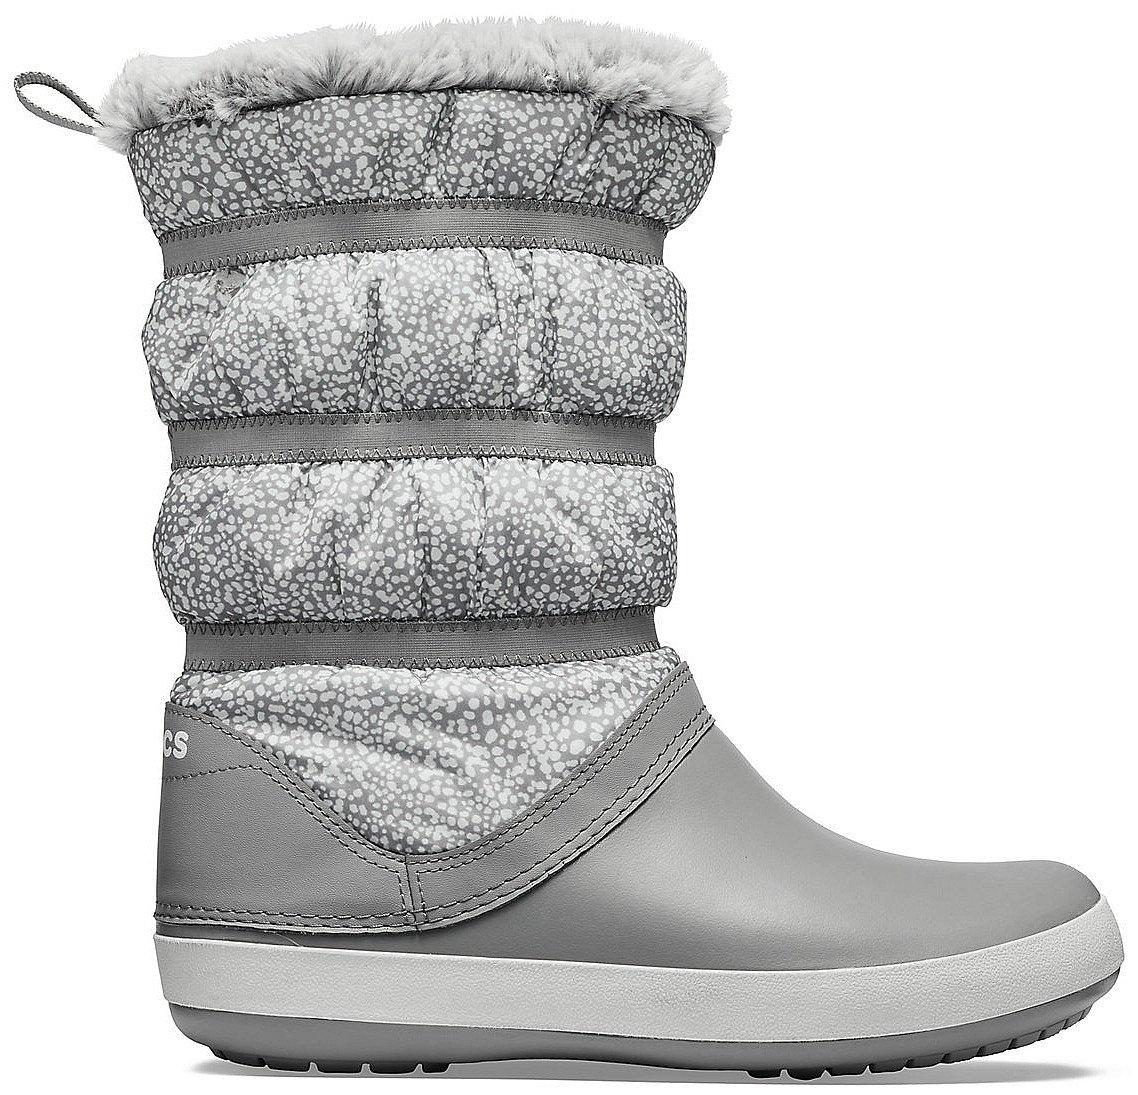 9d48ef1523 CROCS Crocband Winter Boot - Glami.sk